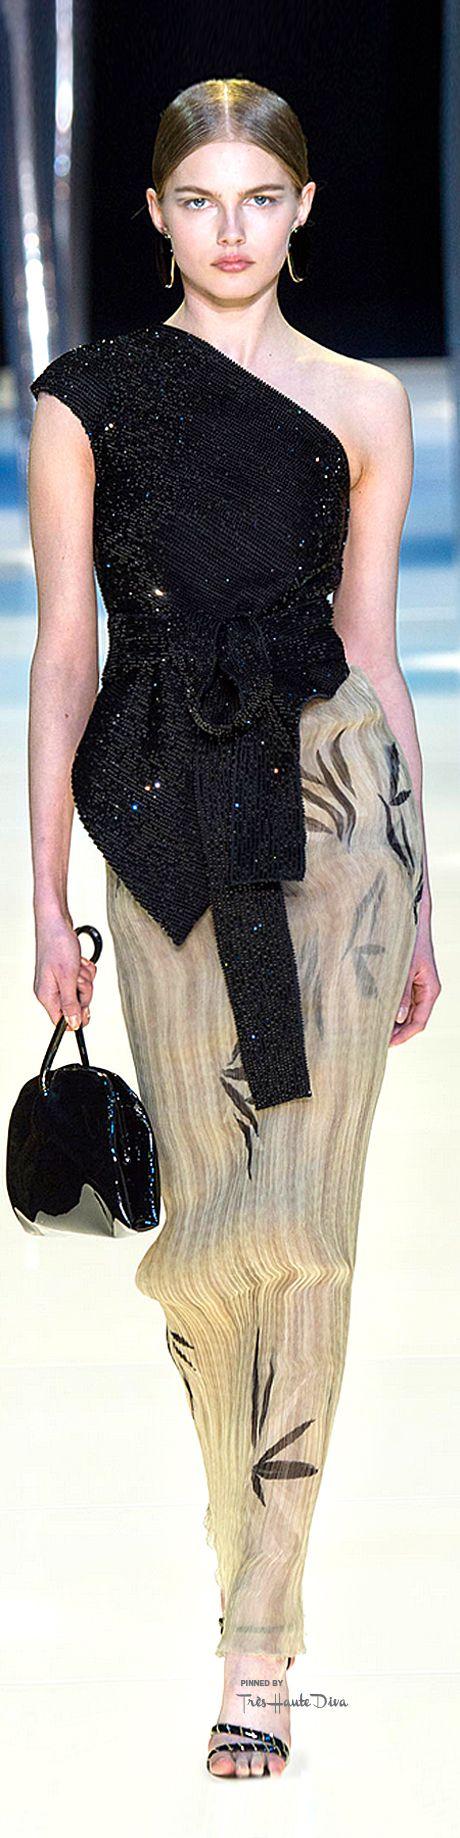 Armani Privé Spring 2015 Couture ♔THD♔ jαɢlαdy